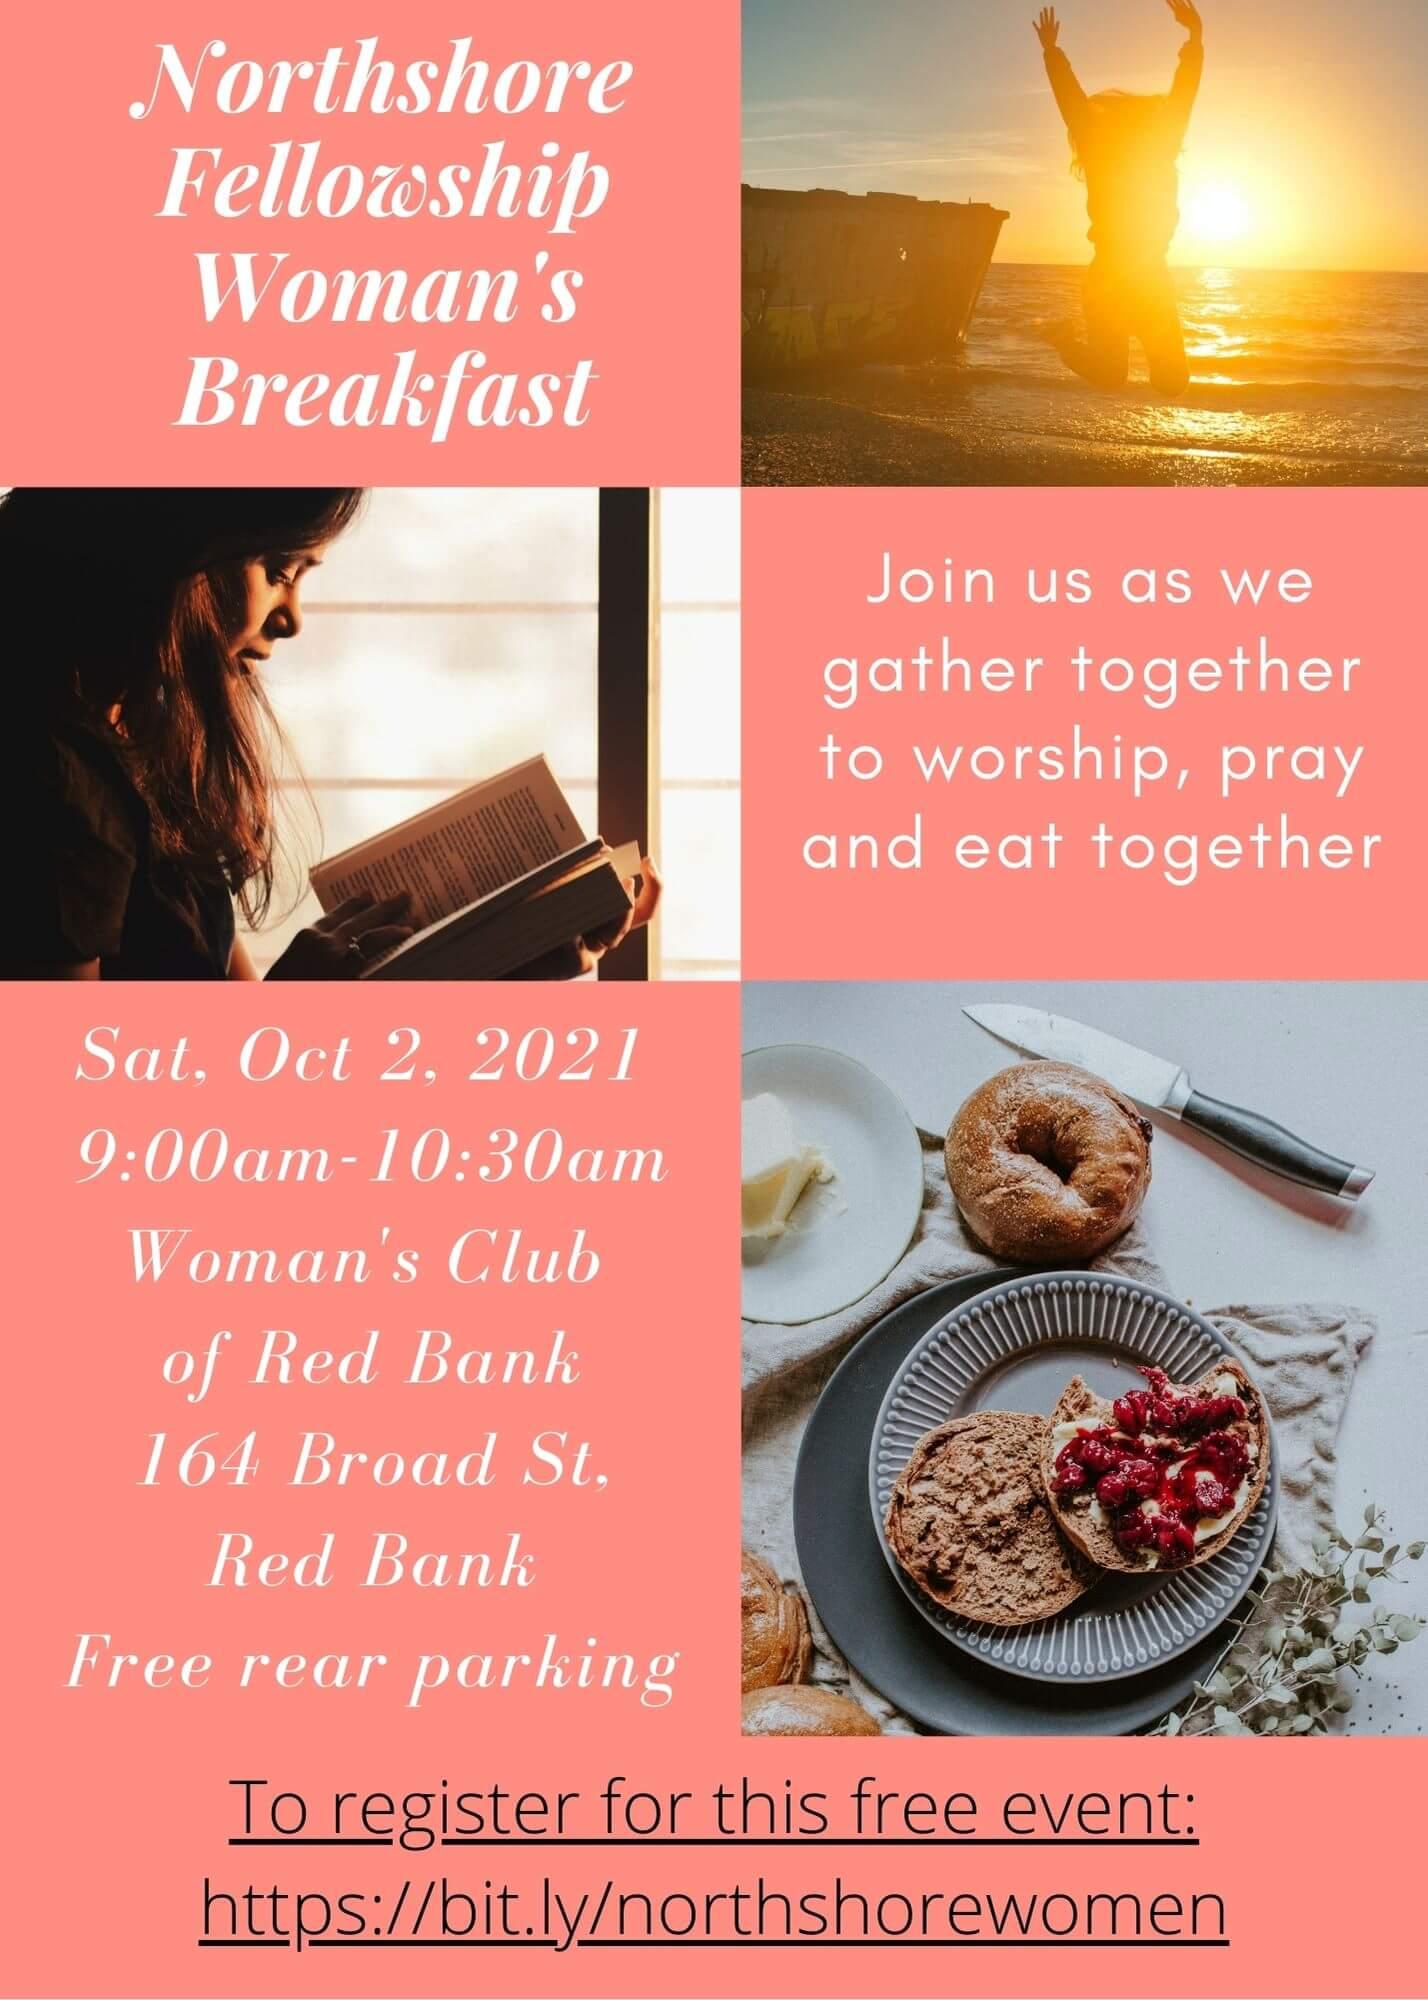 Northshore Fellowship Woman's Breakfast October 2, 2021